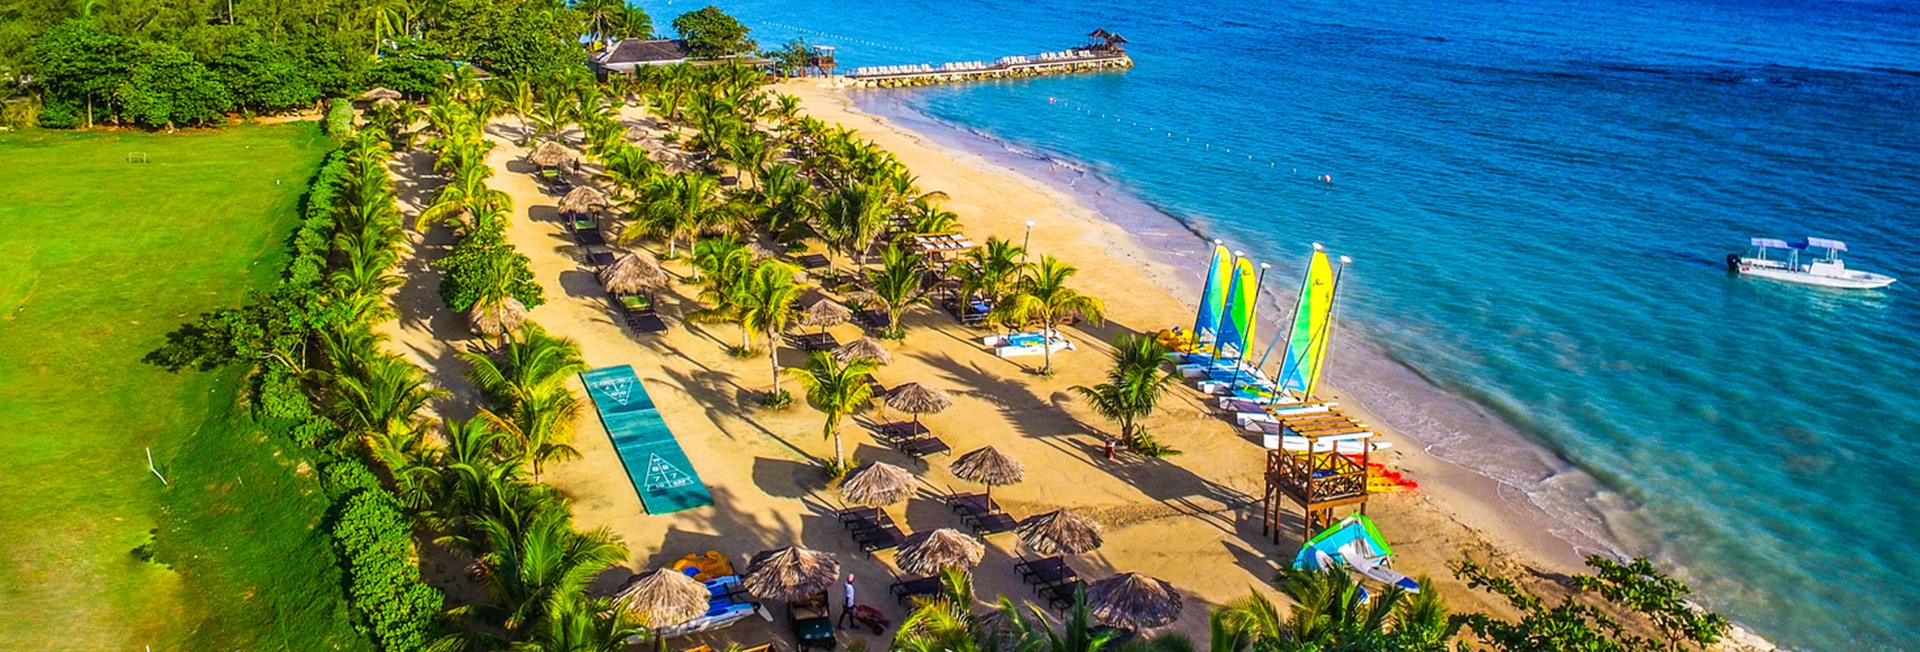 jamaica-dest.jpg